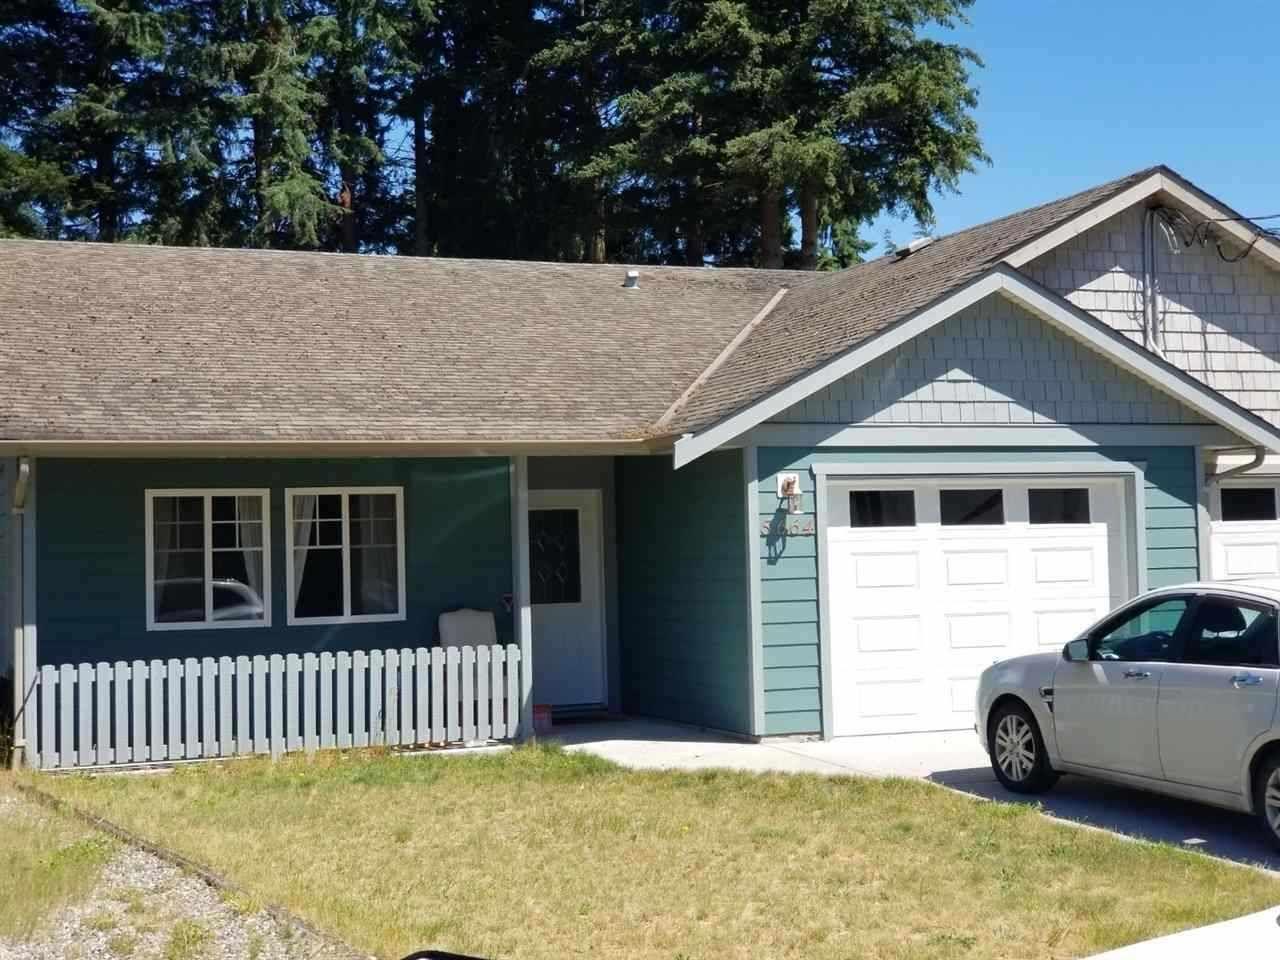 Main Photo: 5664 TRIDENT Avenue in Sechelt: Sechelt District House for sale (Sunshine Coast)  : MLS®# R2370476